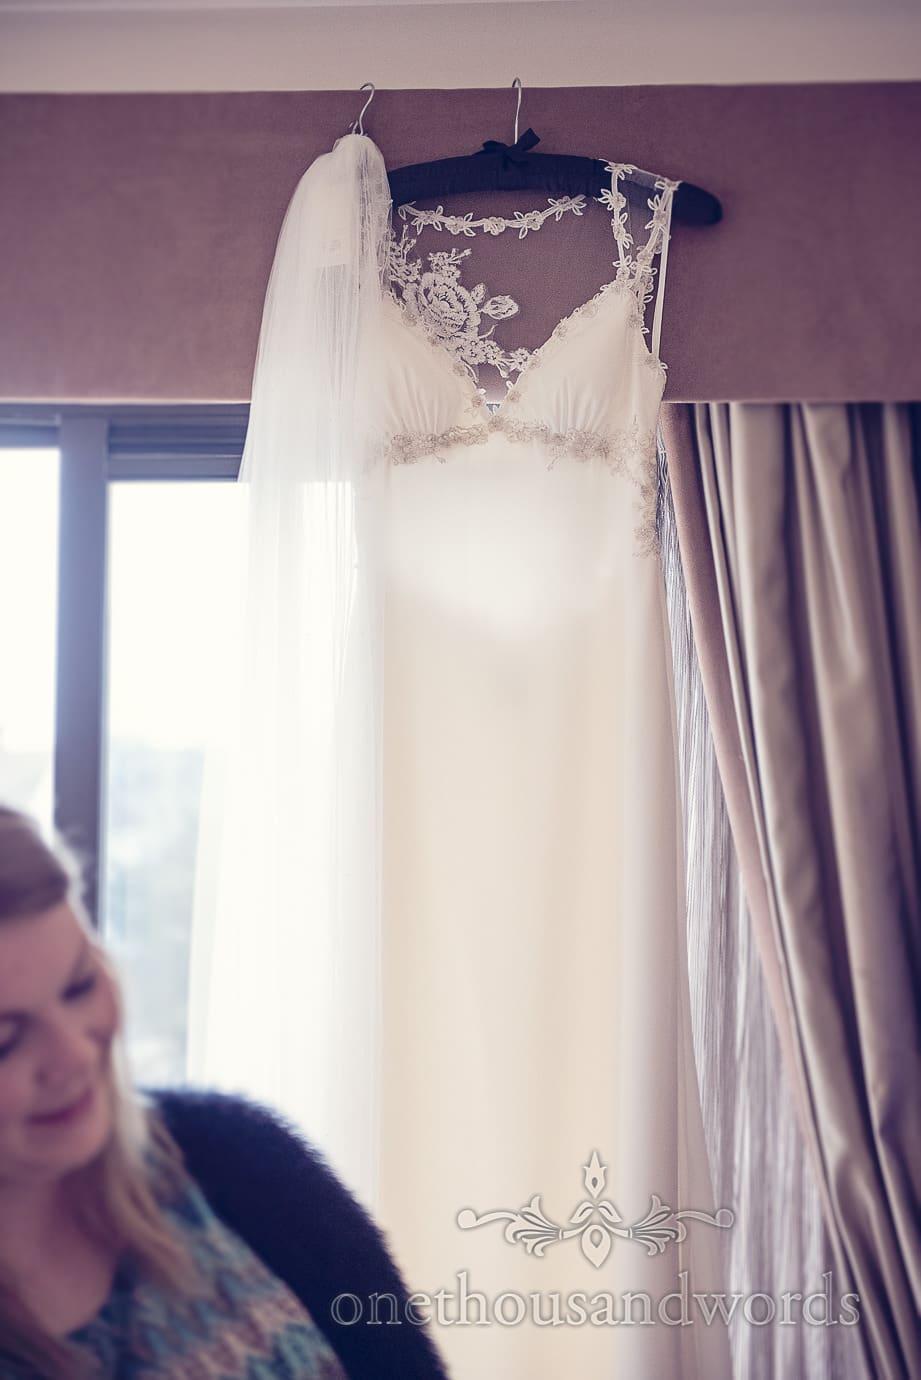 White wedding dress hangs in window before Italian Villa Wedding Photographs